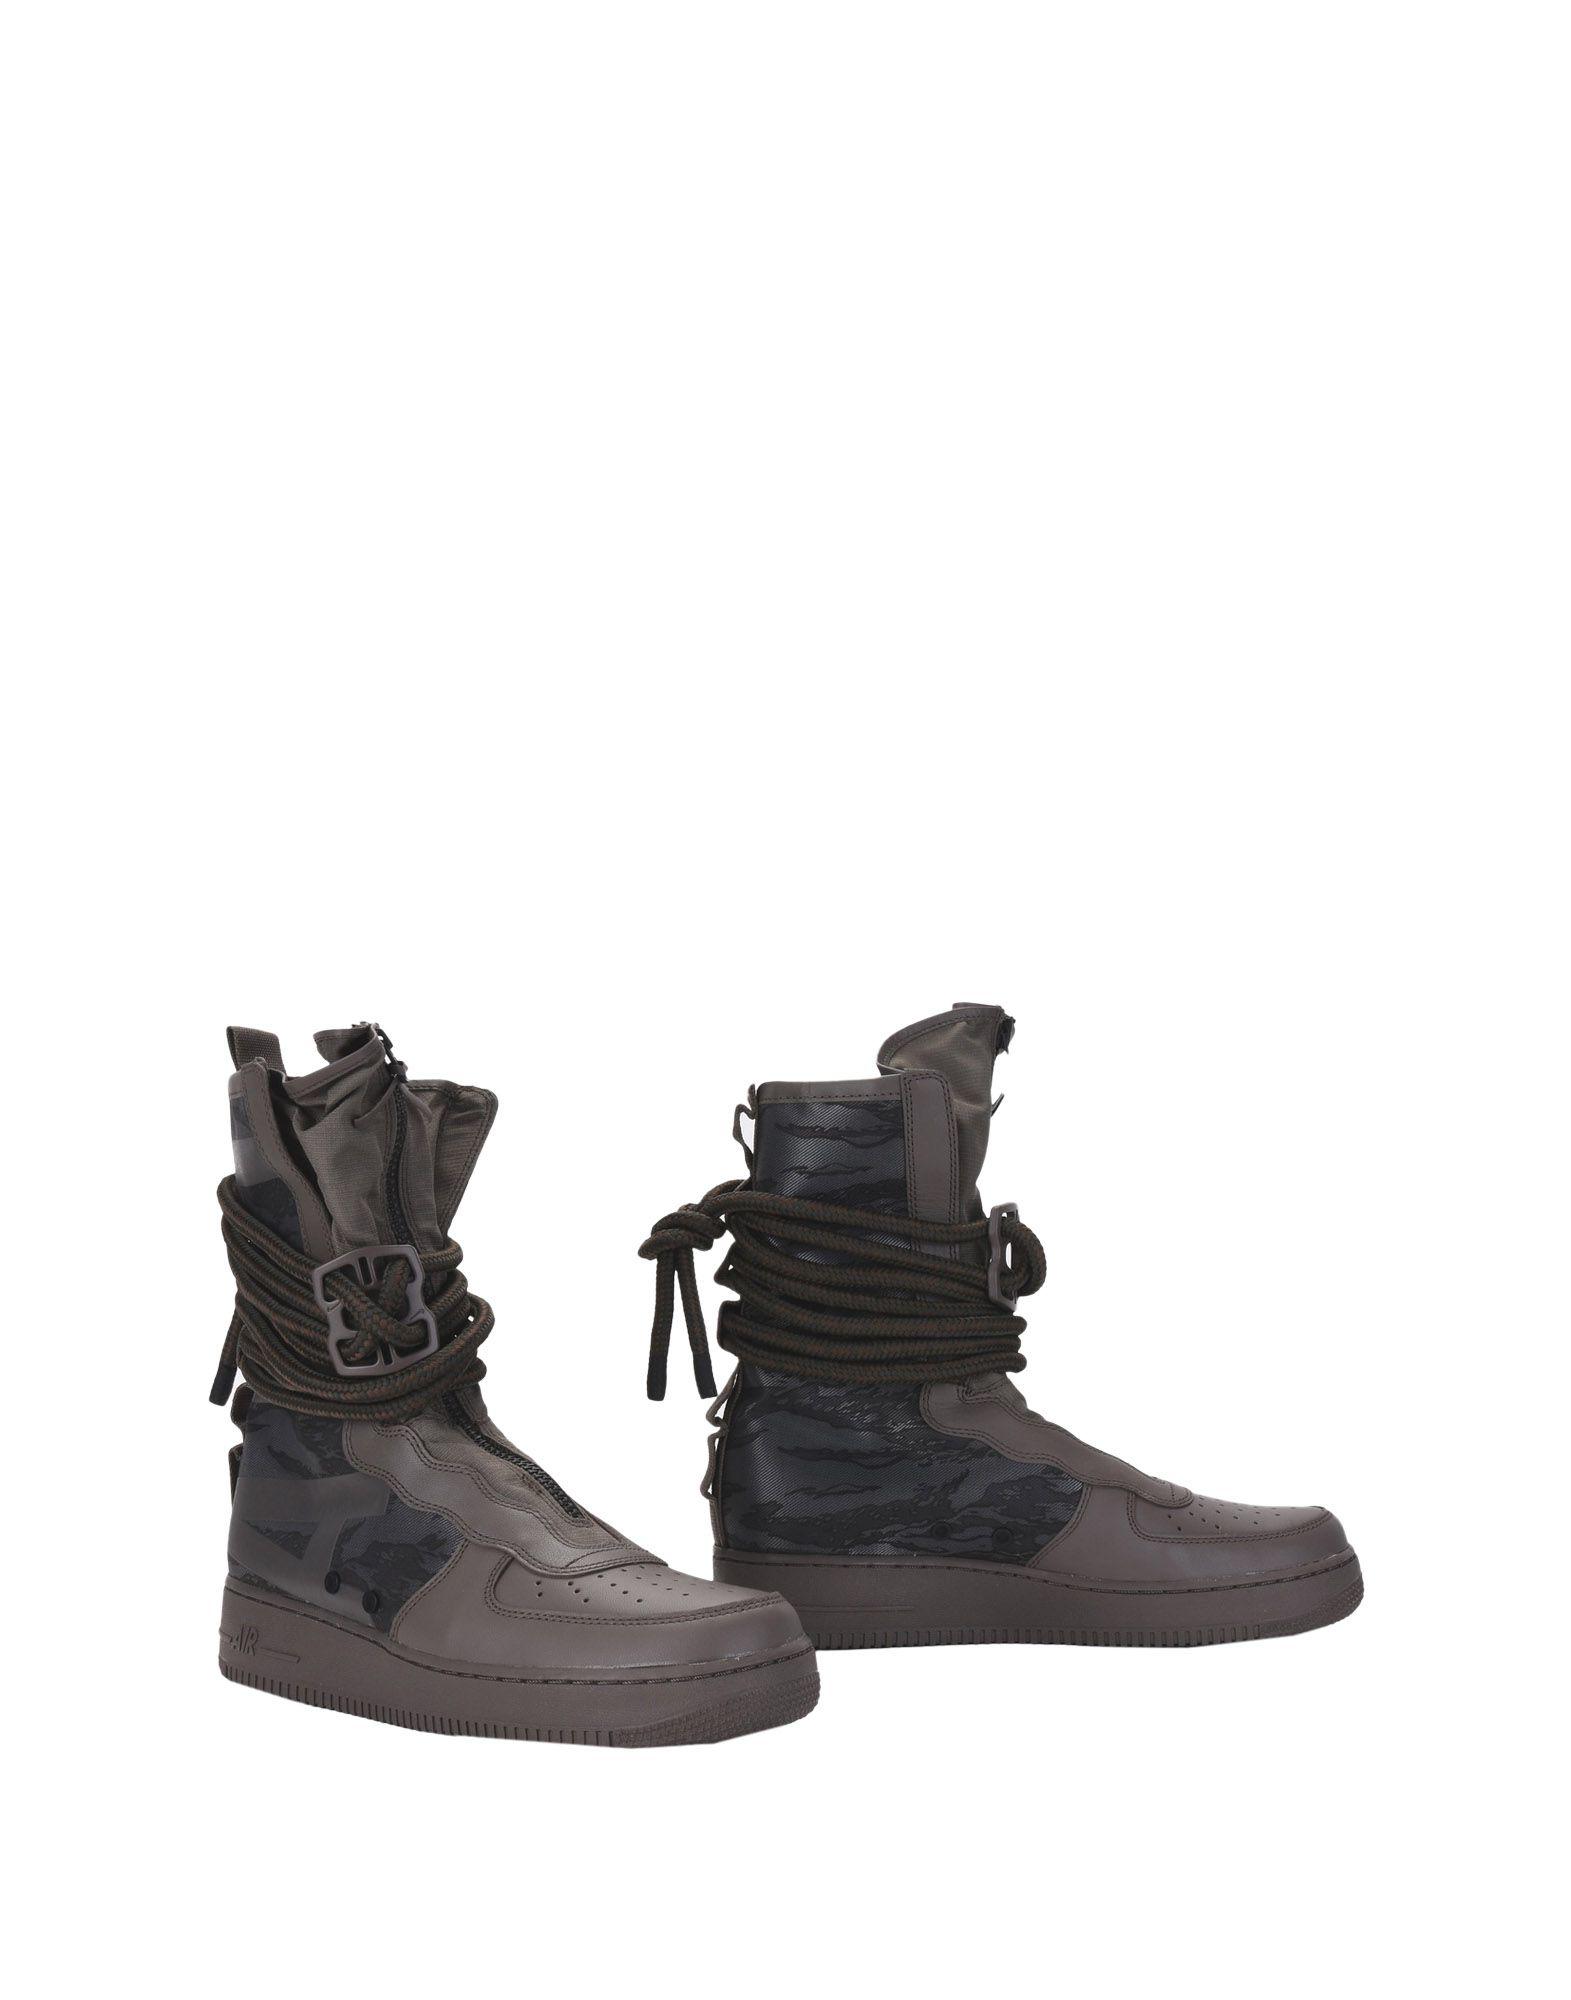 Sneakers Nike Sf Af1 Hi - Uomo - Acquista online su